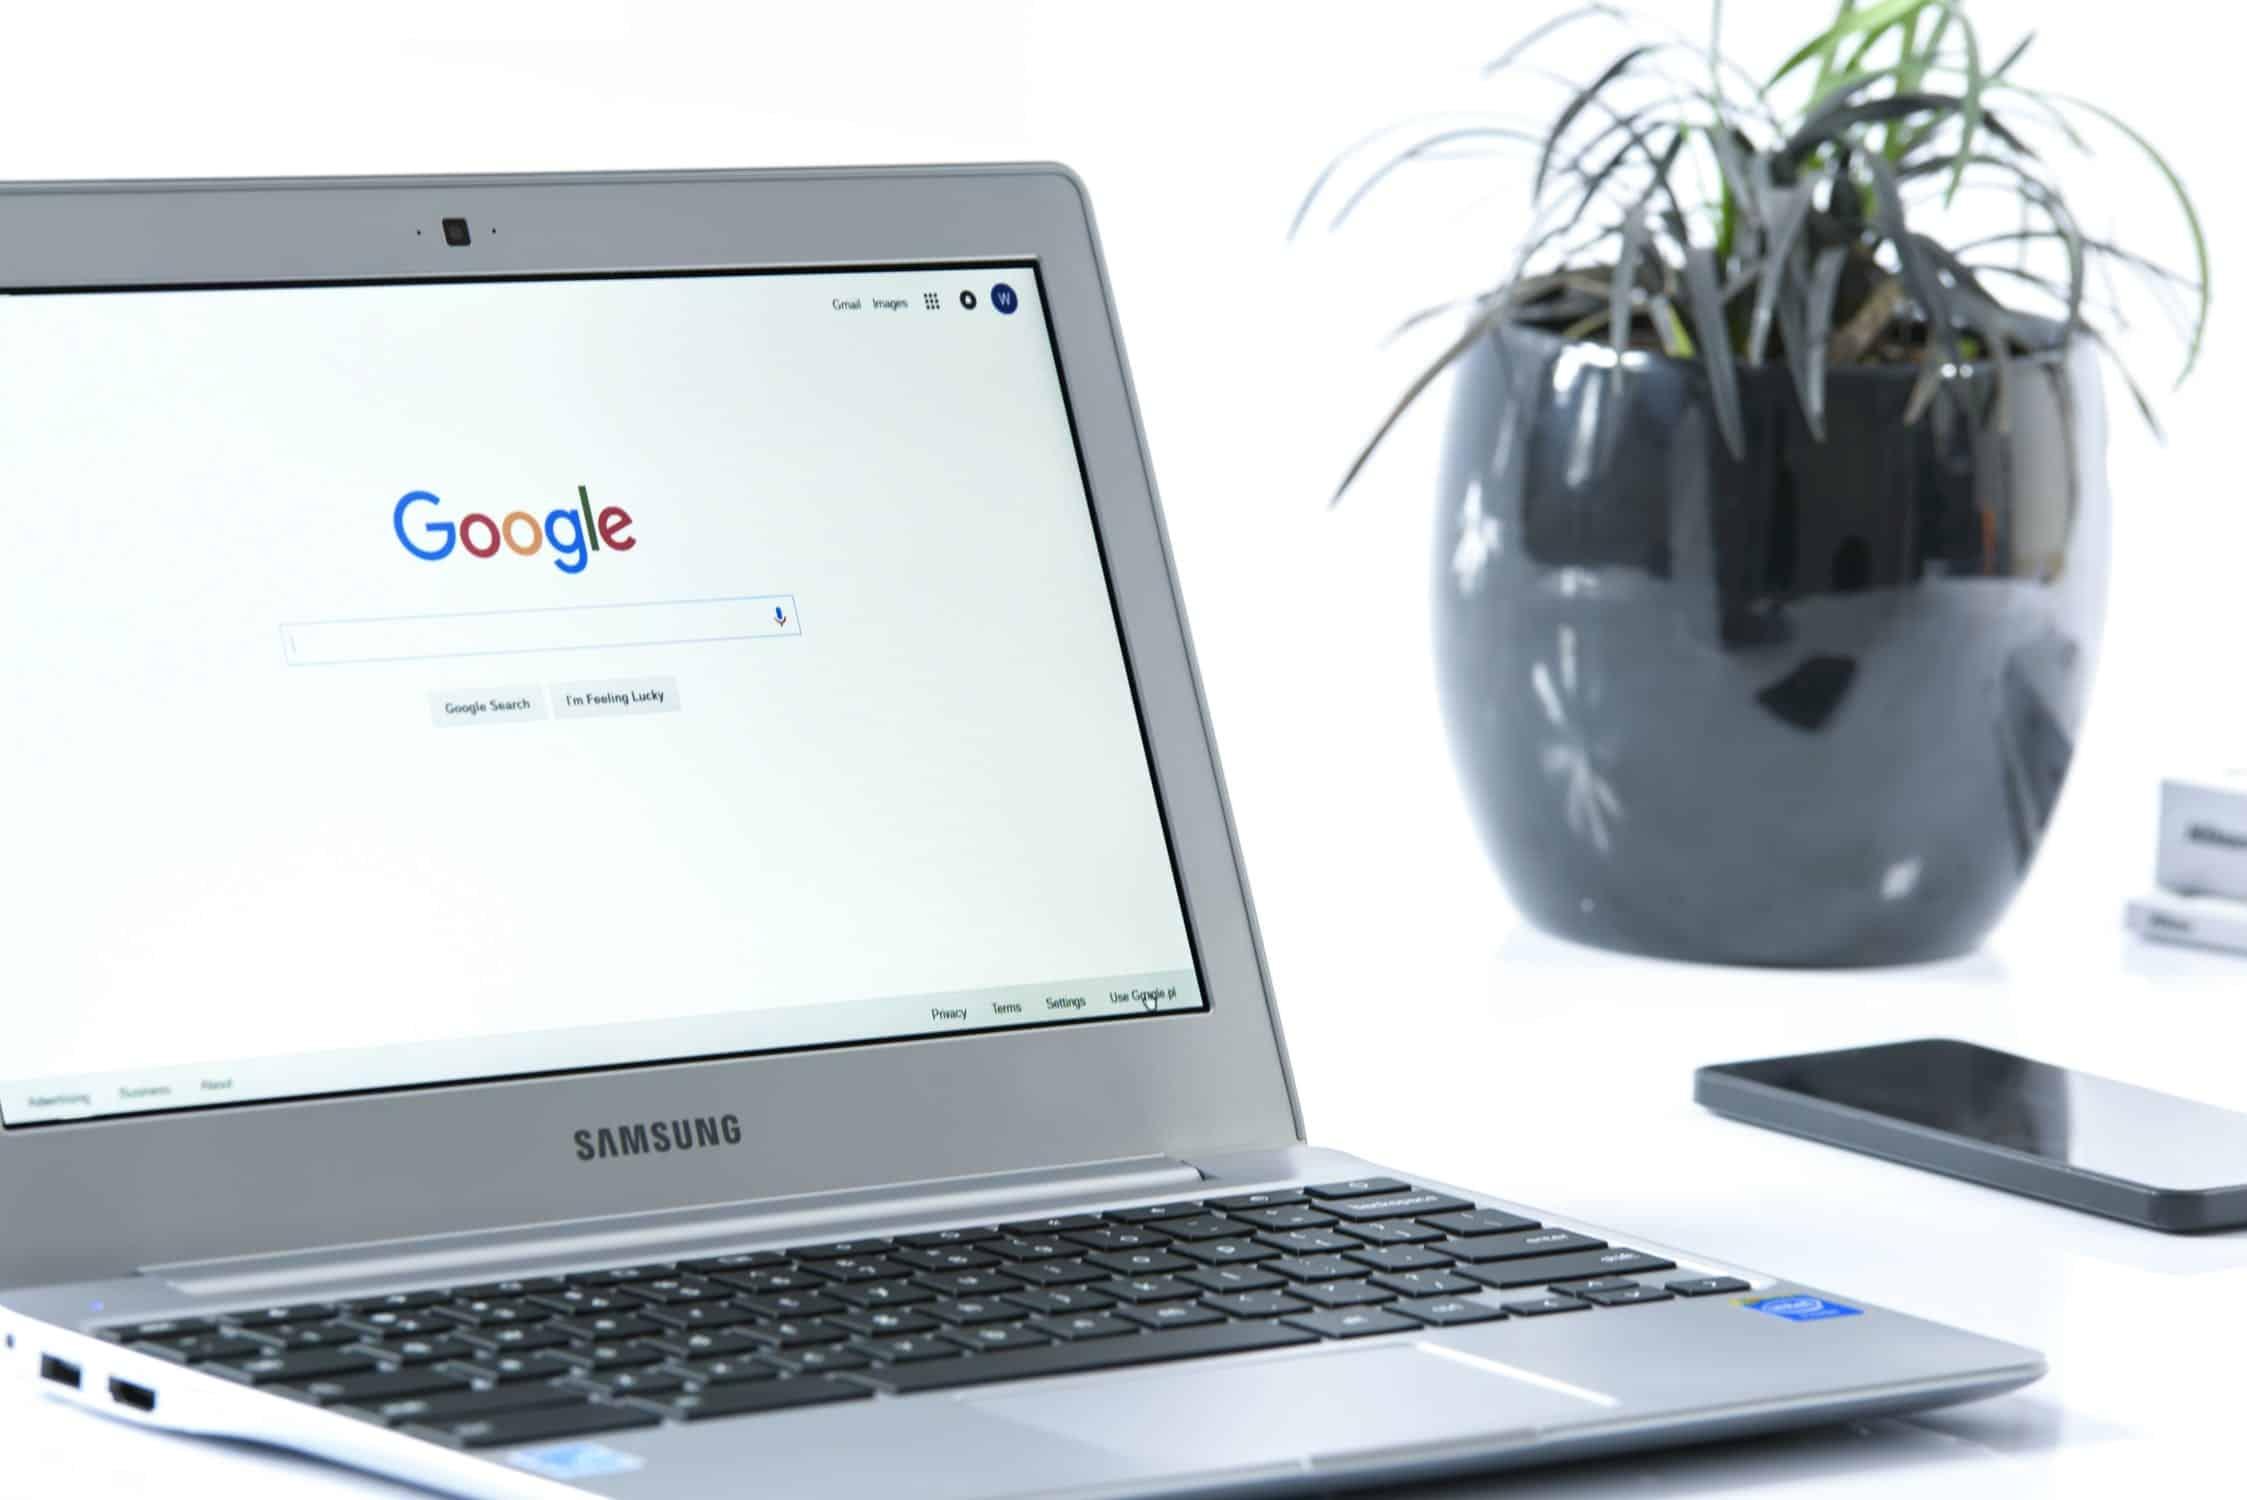 laptop with google icon